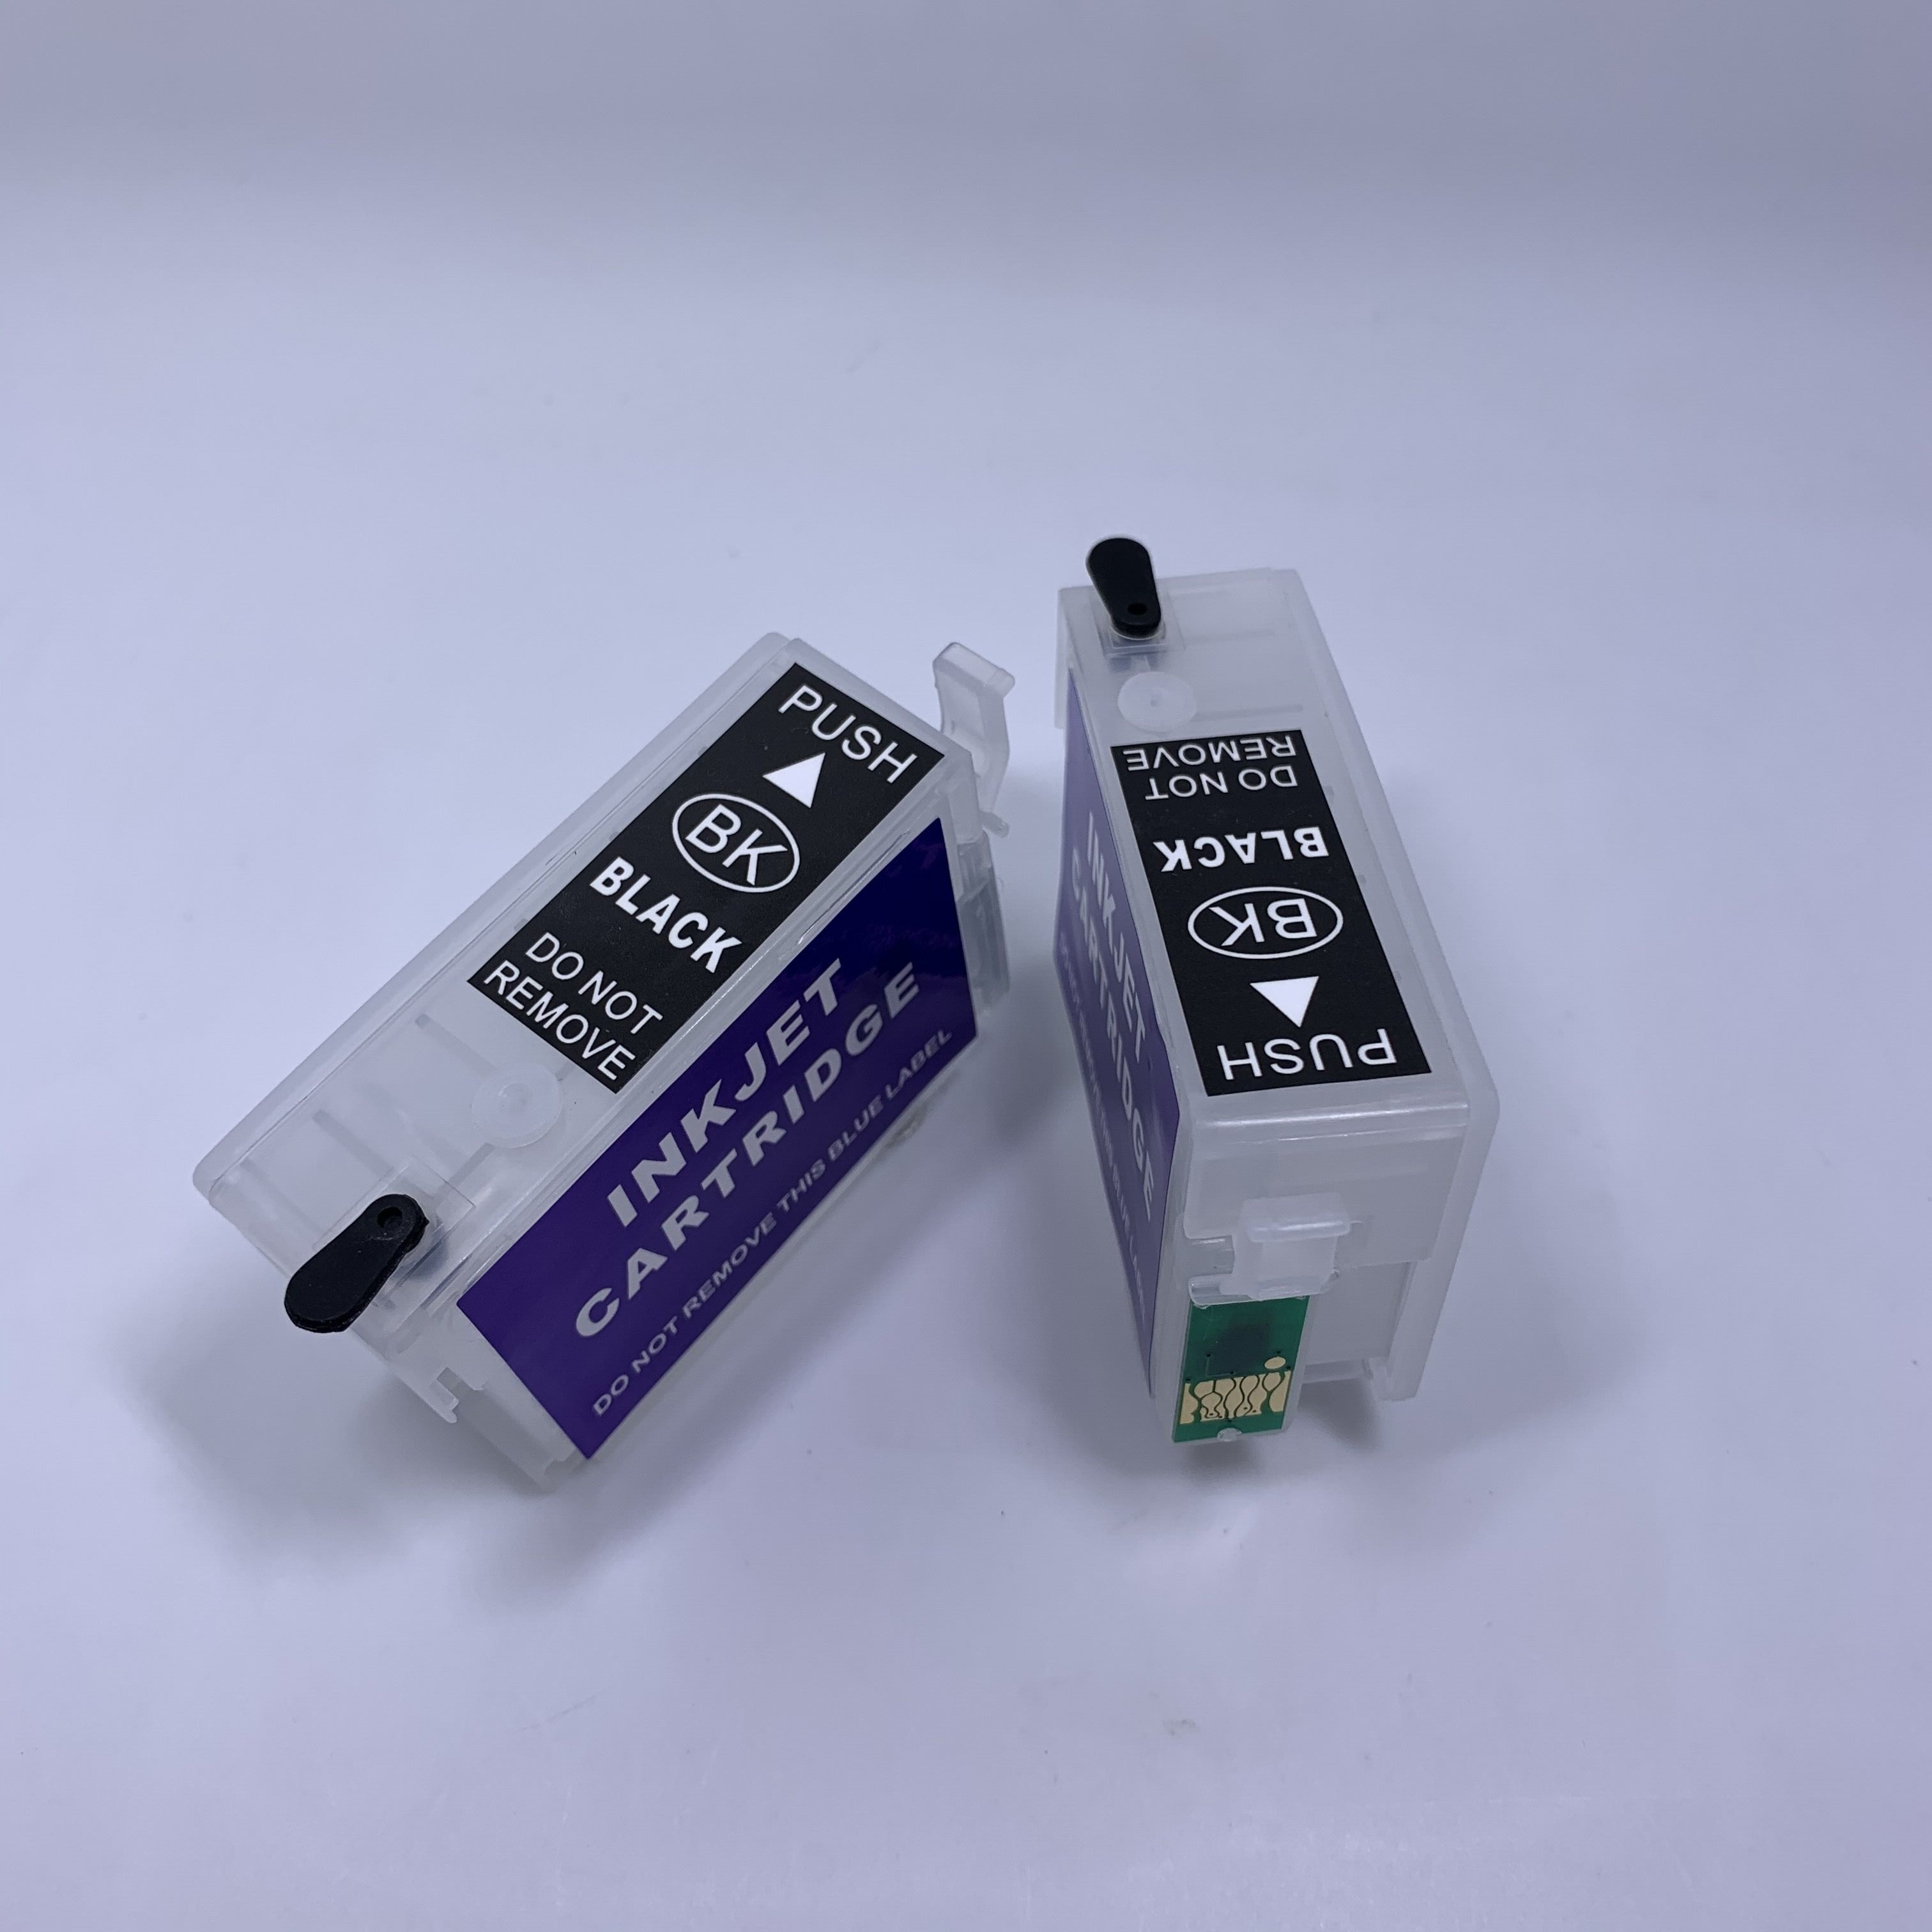 Cartucho de tinta recargable yomat 2 uds T1361 T1361 para impresora Epson K101 K201 K301 (con Chip permanente)